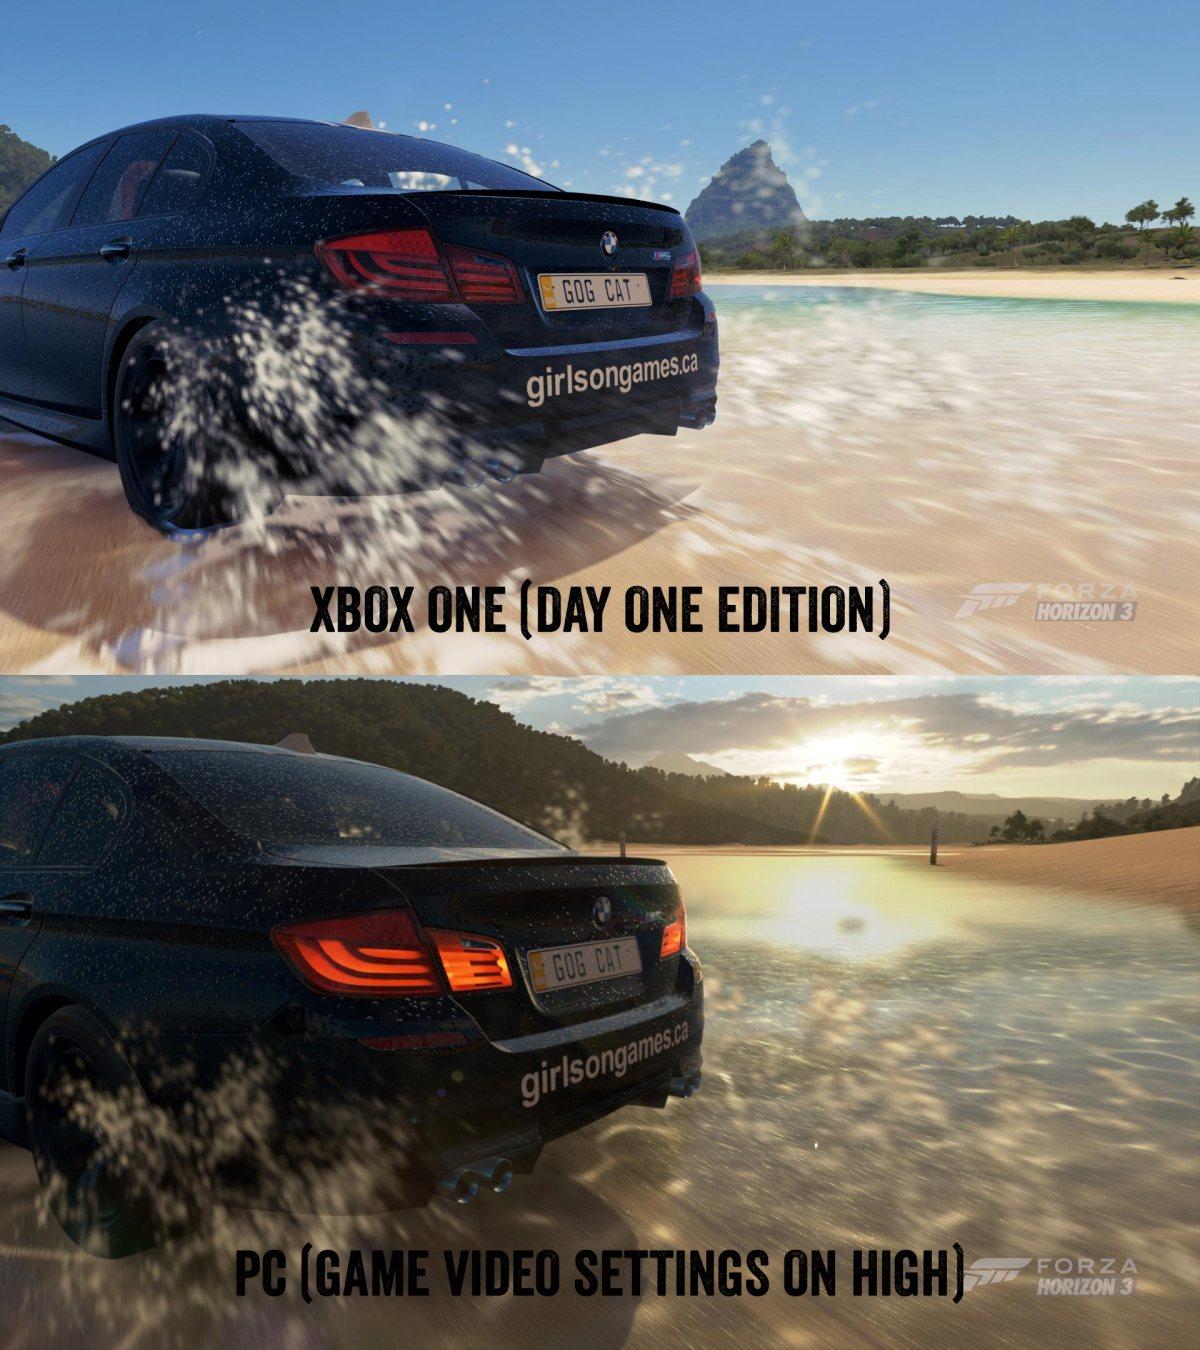 Forza Horizon 3: XB1 vs PC